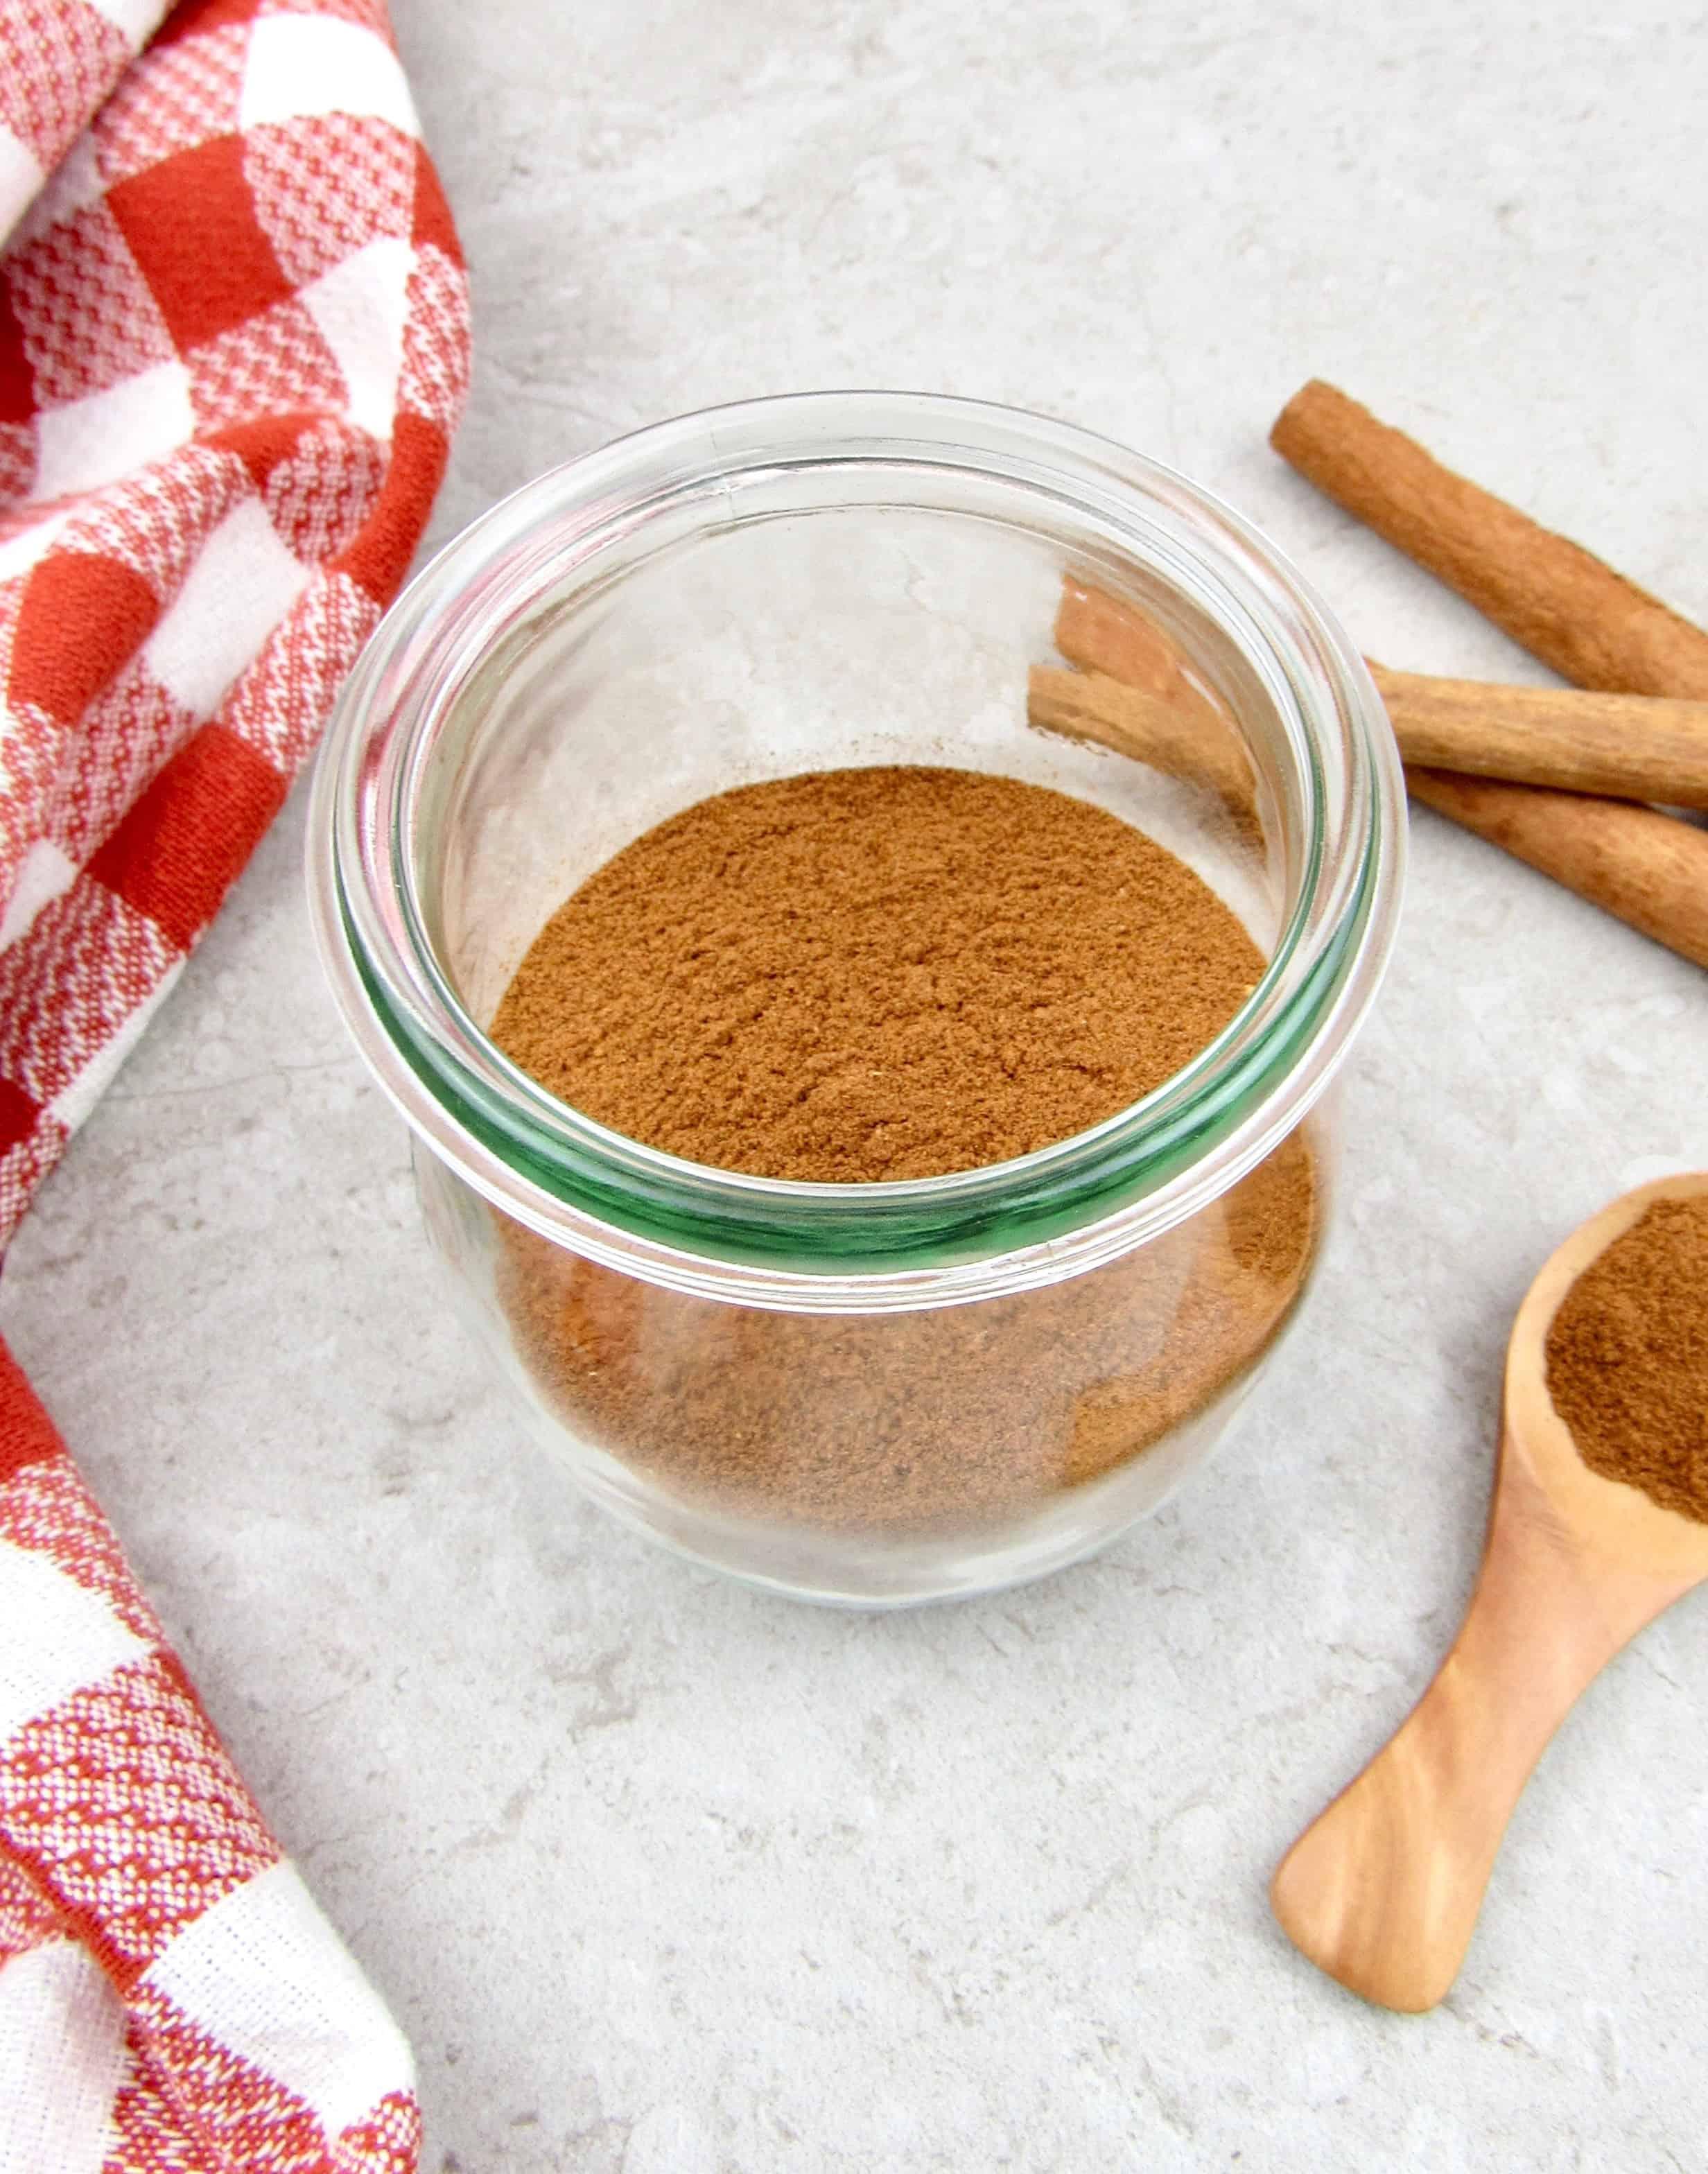 apple pie spice mixture in glass jar with cinnamon sticks on background